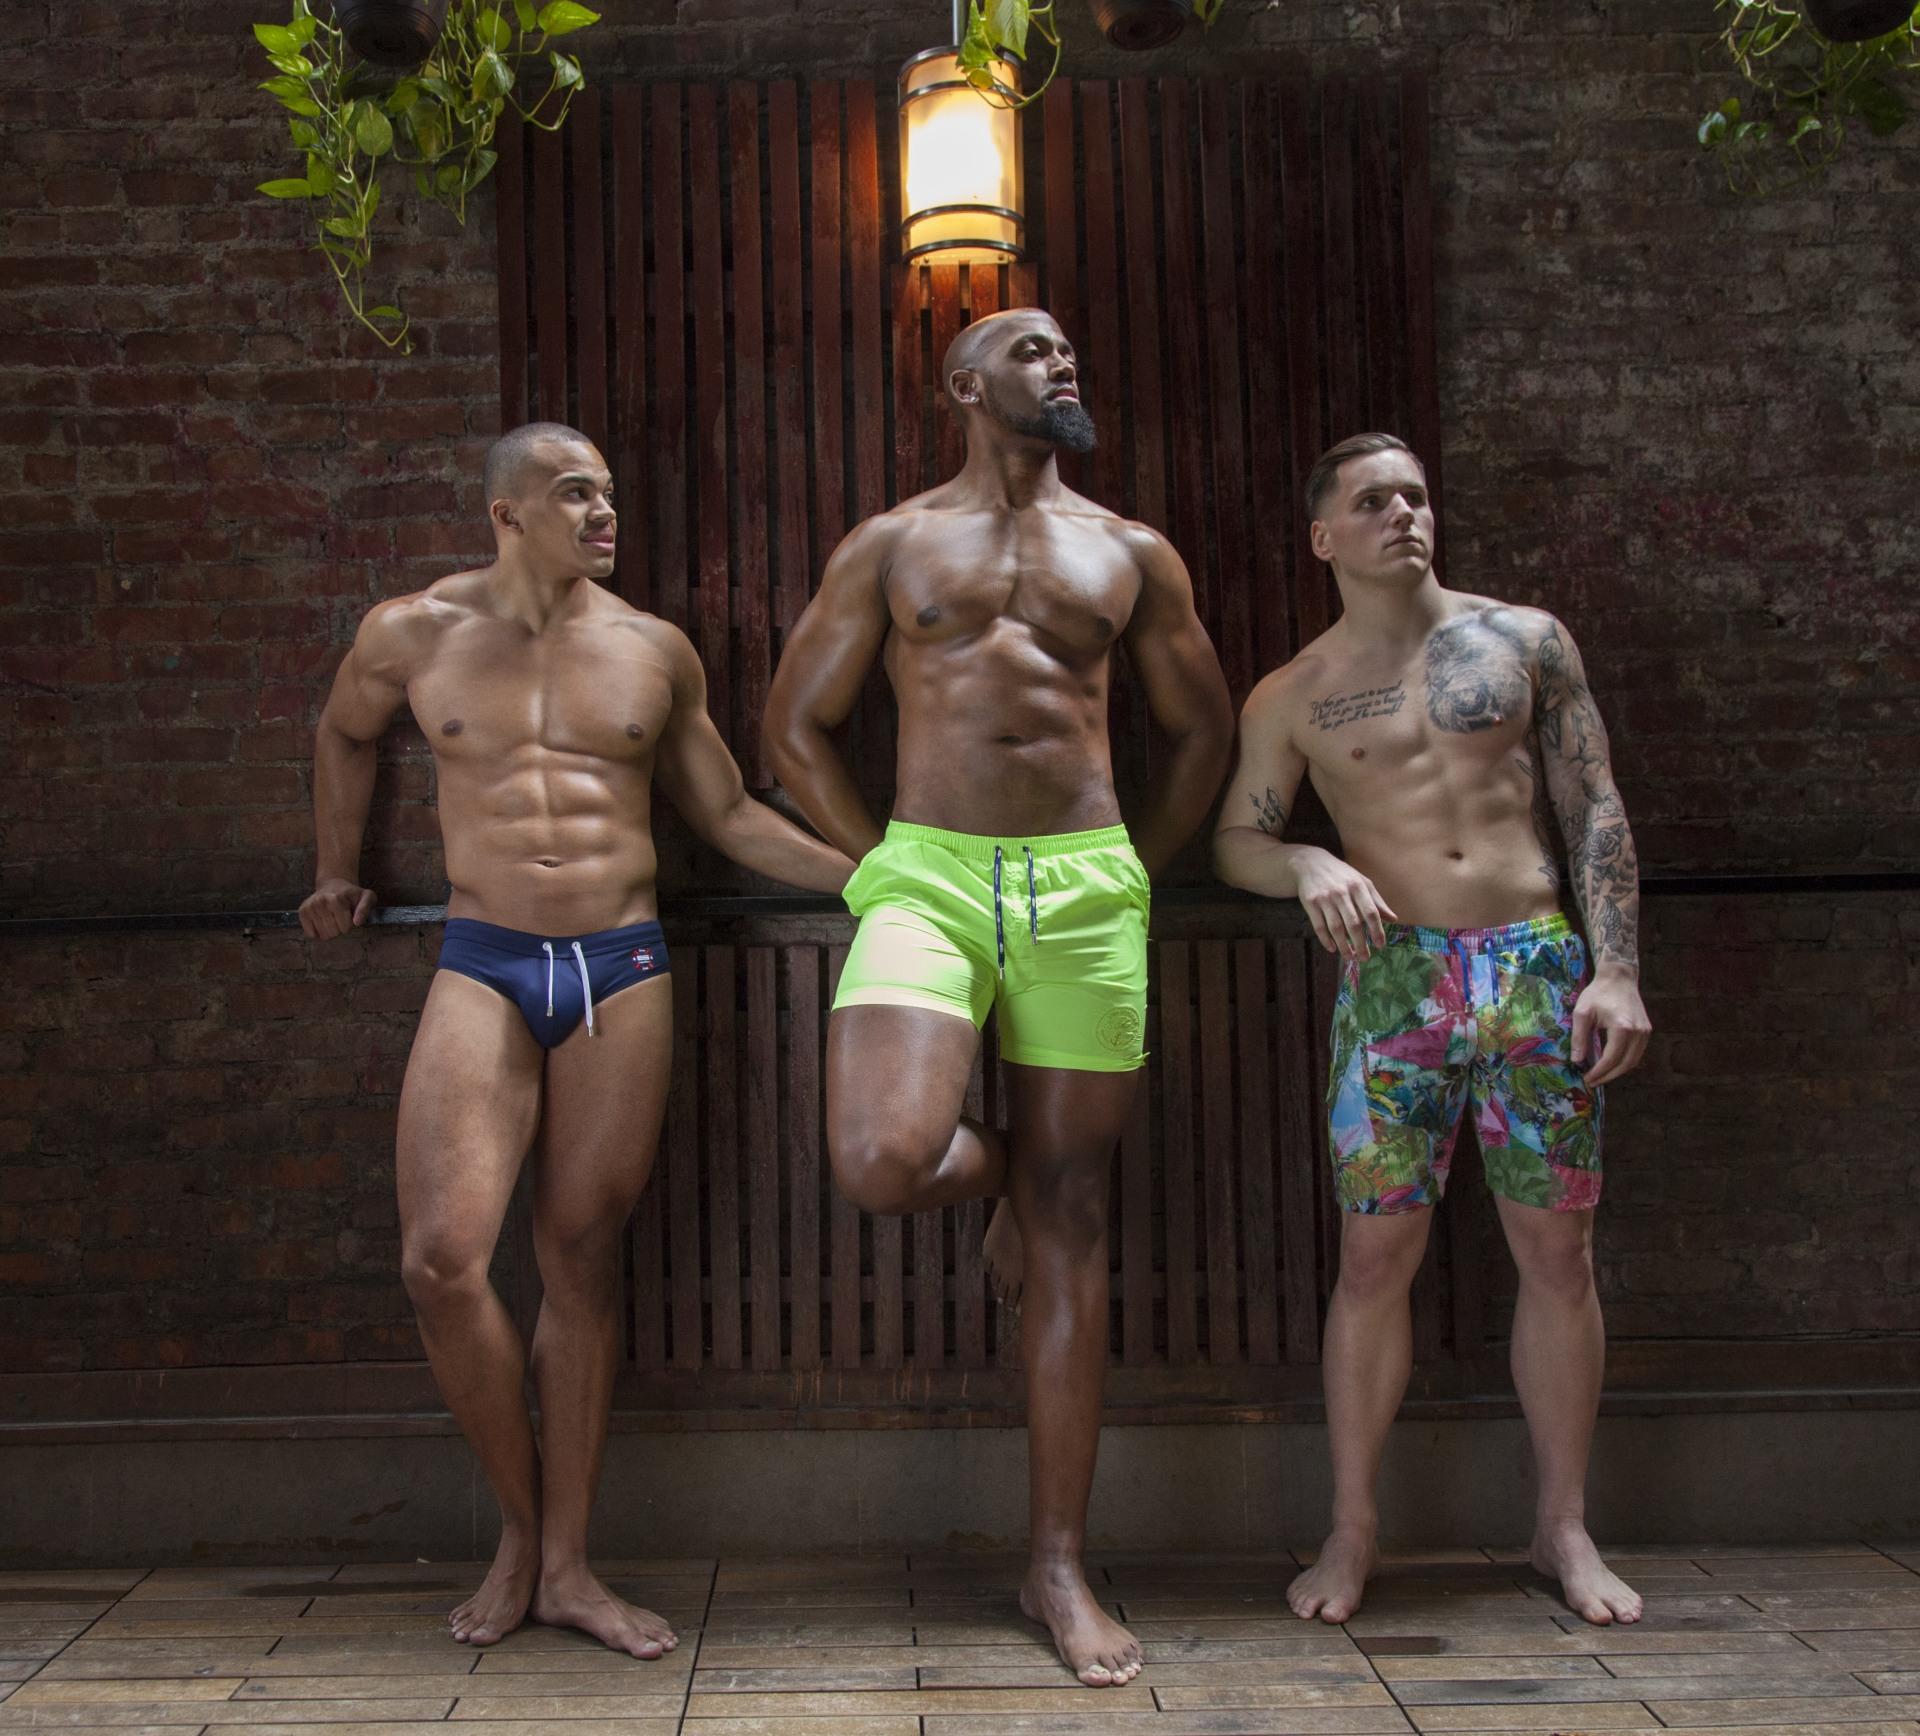 Jeremy, Lessard, Jeremy Lessard, Model, Male Model, Portfolio, Modeling, Jeremy Modeling, Swimsuit, ES Collection, Barcelona Spain, Spain, Jeremy in Swimsuit,